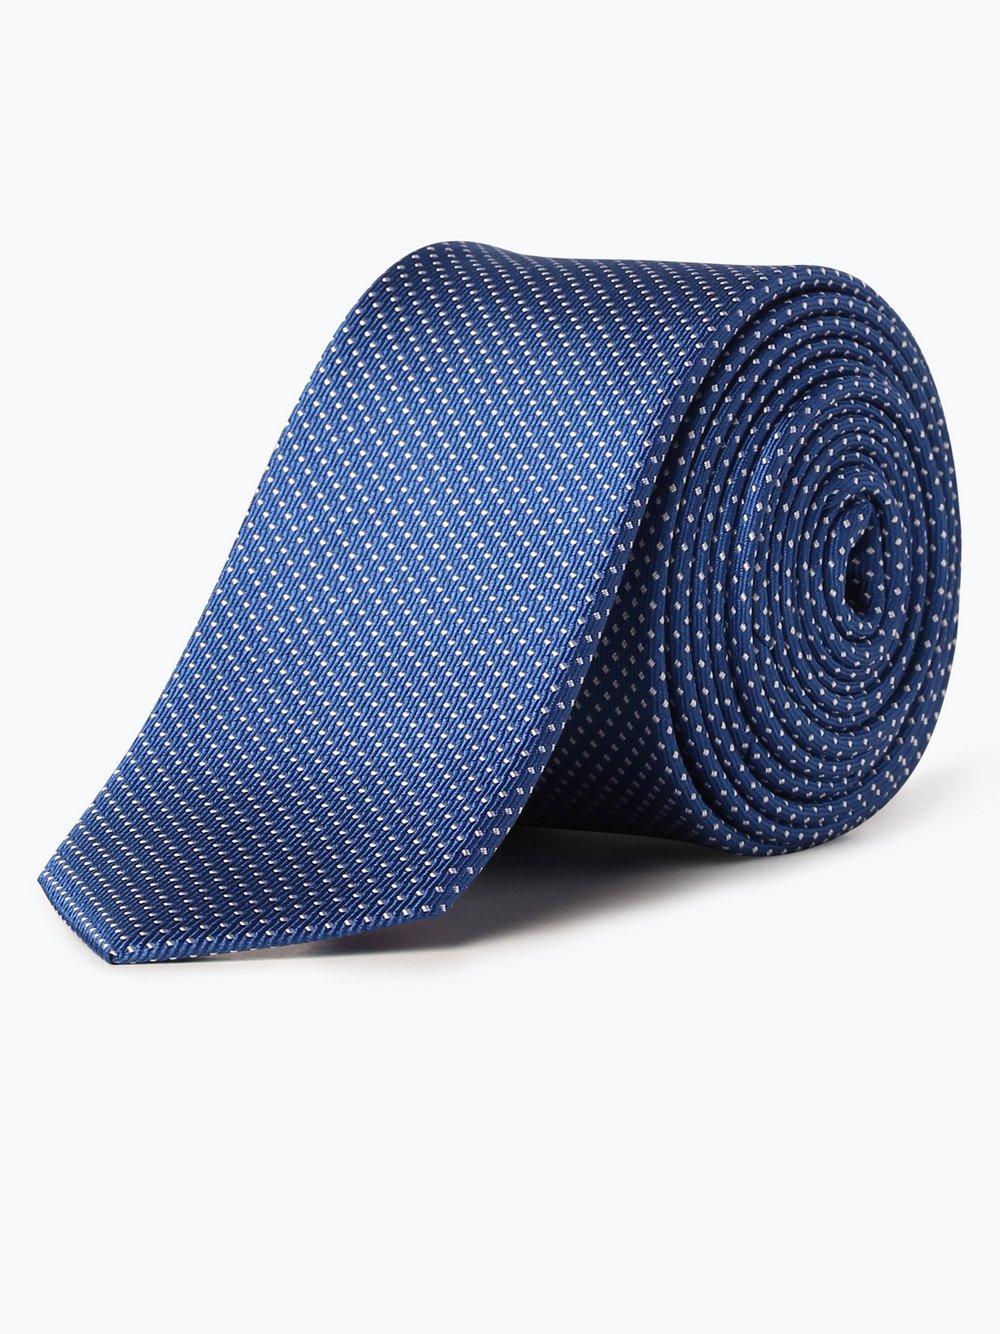 Olymp Level Five – Krawat jedwabny męski, niebieski Van Graaf 391756-0003